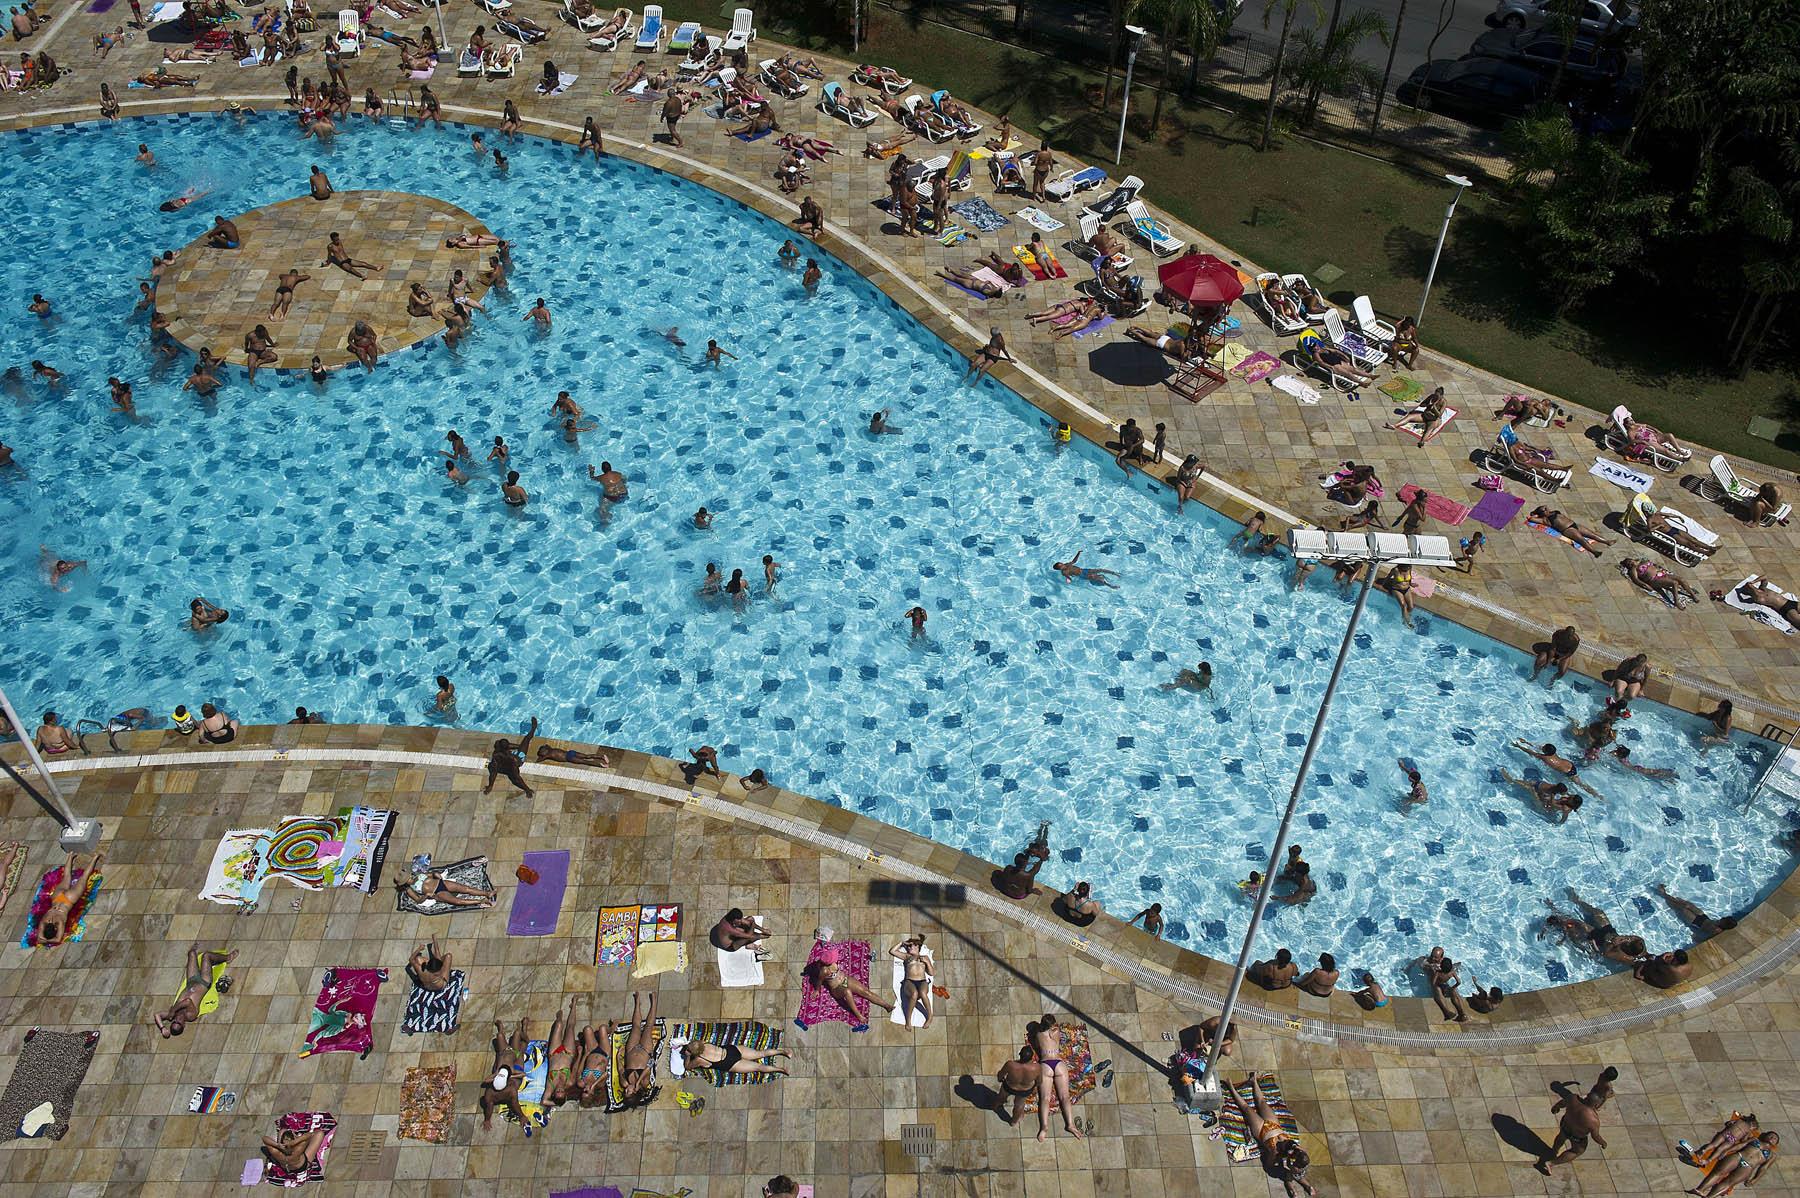 People swim at the SESC Belenzinho club in Sao Paulo, Brazil on Jan. 31, 2014.